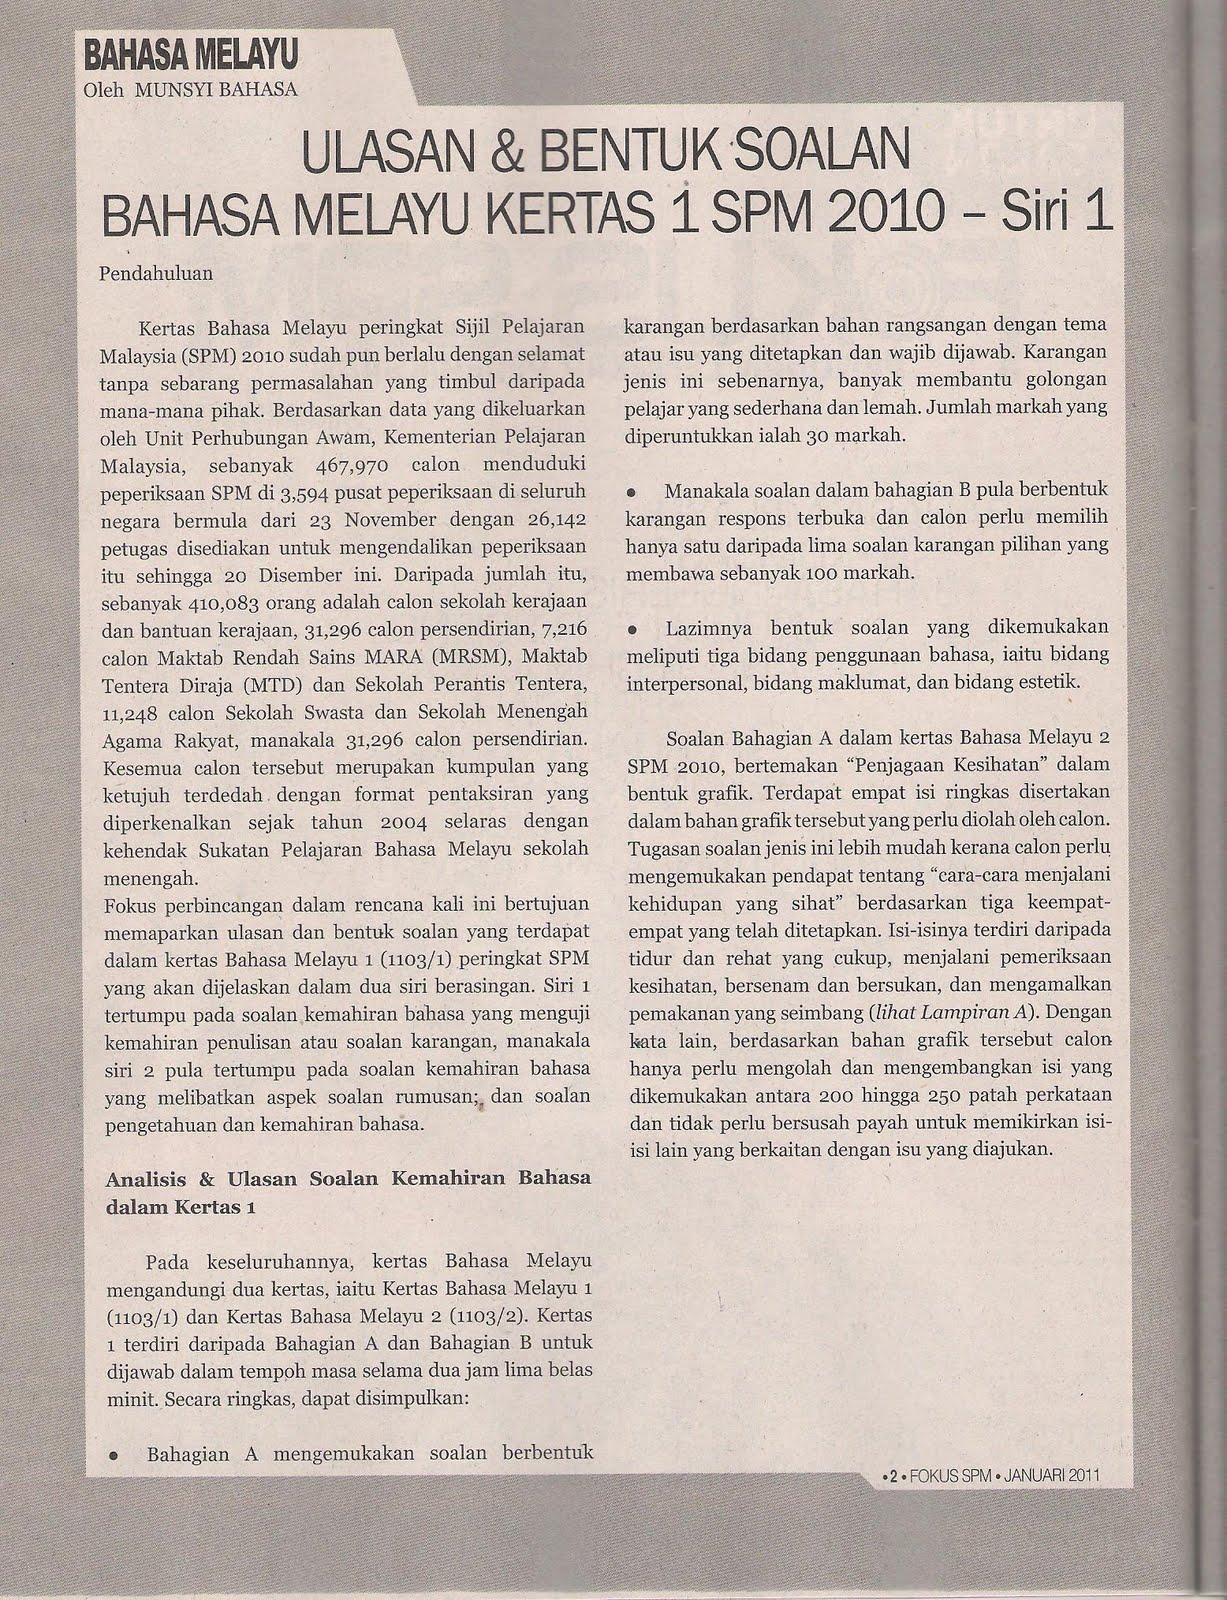 Bahasa melayu spm 2010